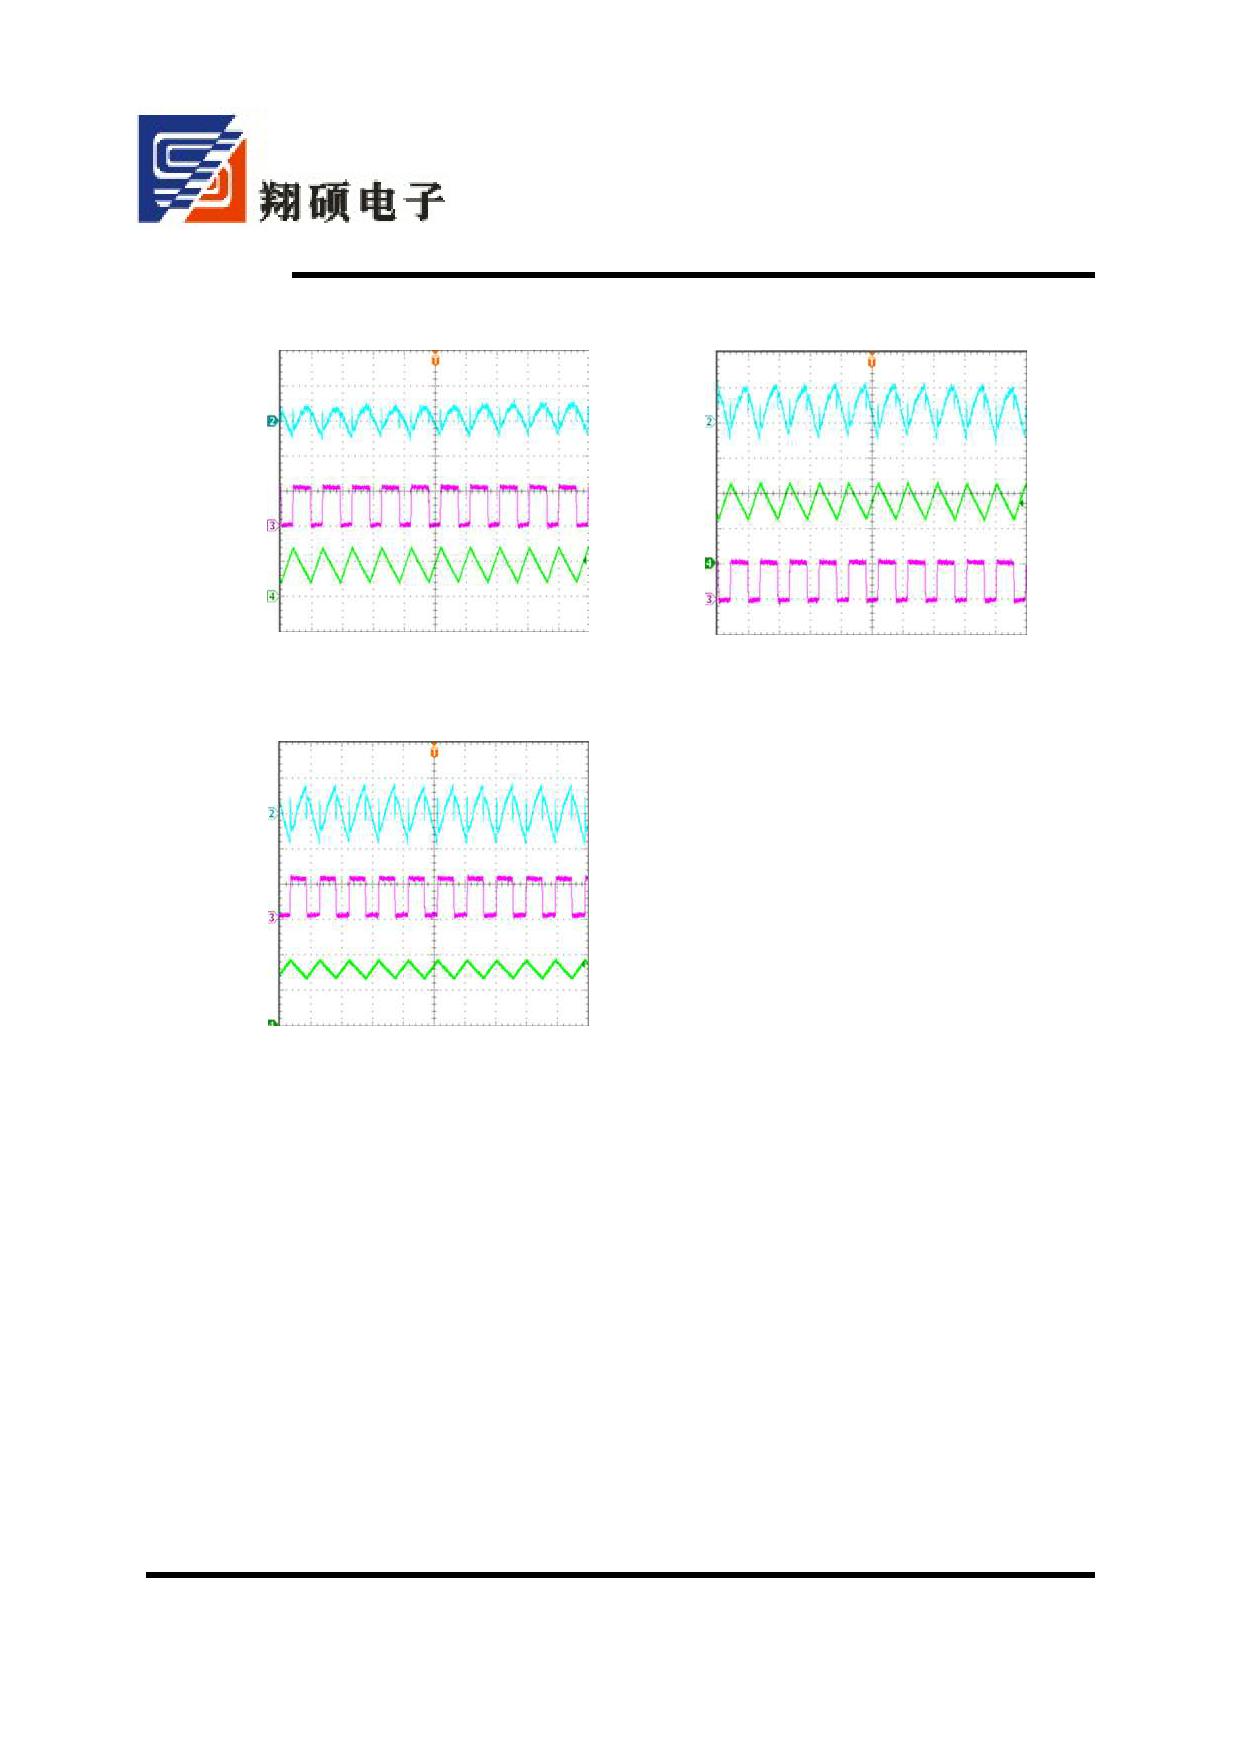 AM9308 pdf, arduino